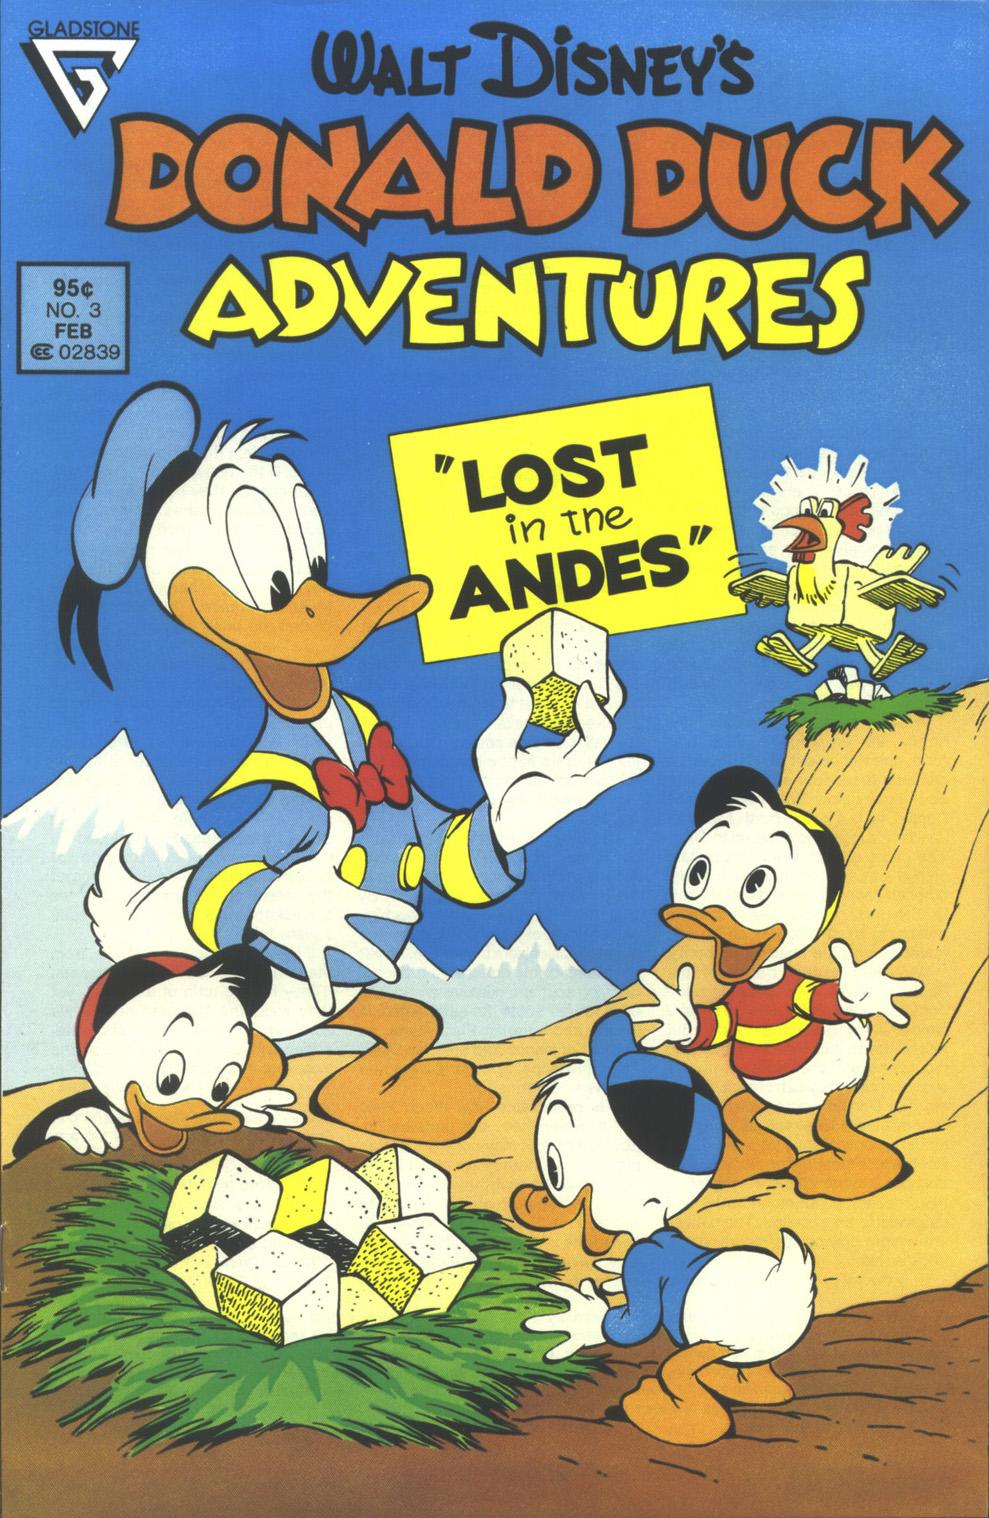 Walt Disney's Donald Duck Adventures (1987) issue 3 - Page 1